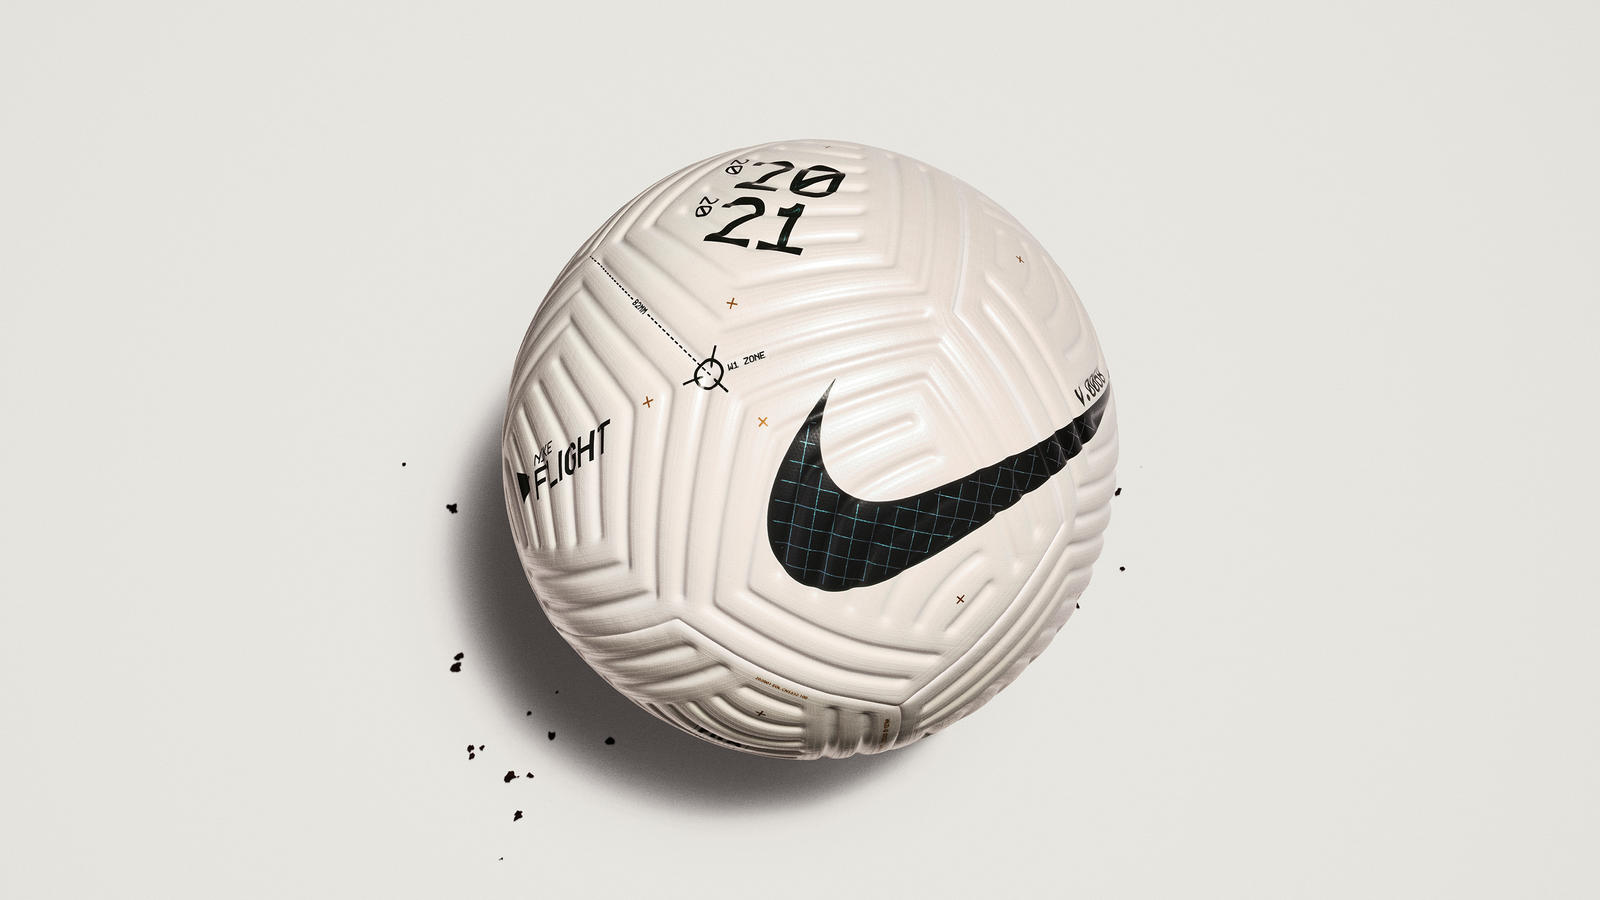 Nike Flight Ball - Nike News